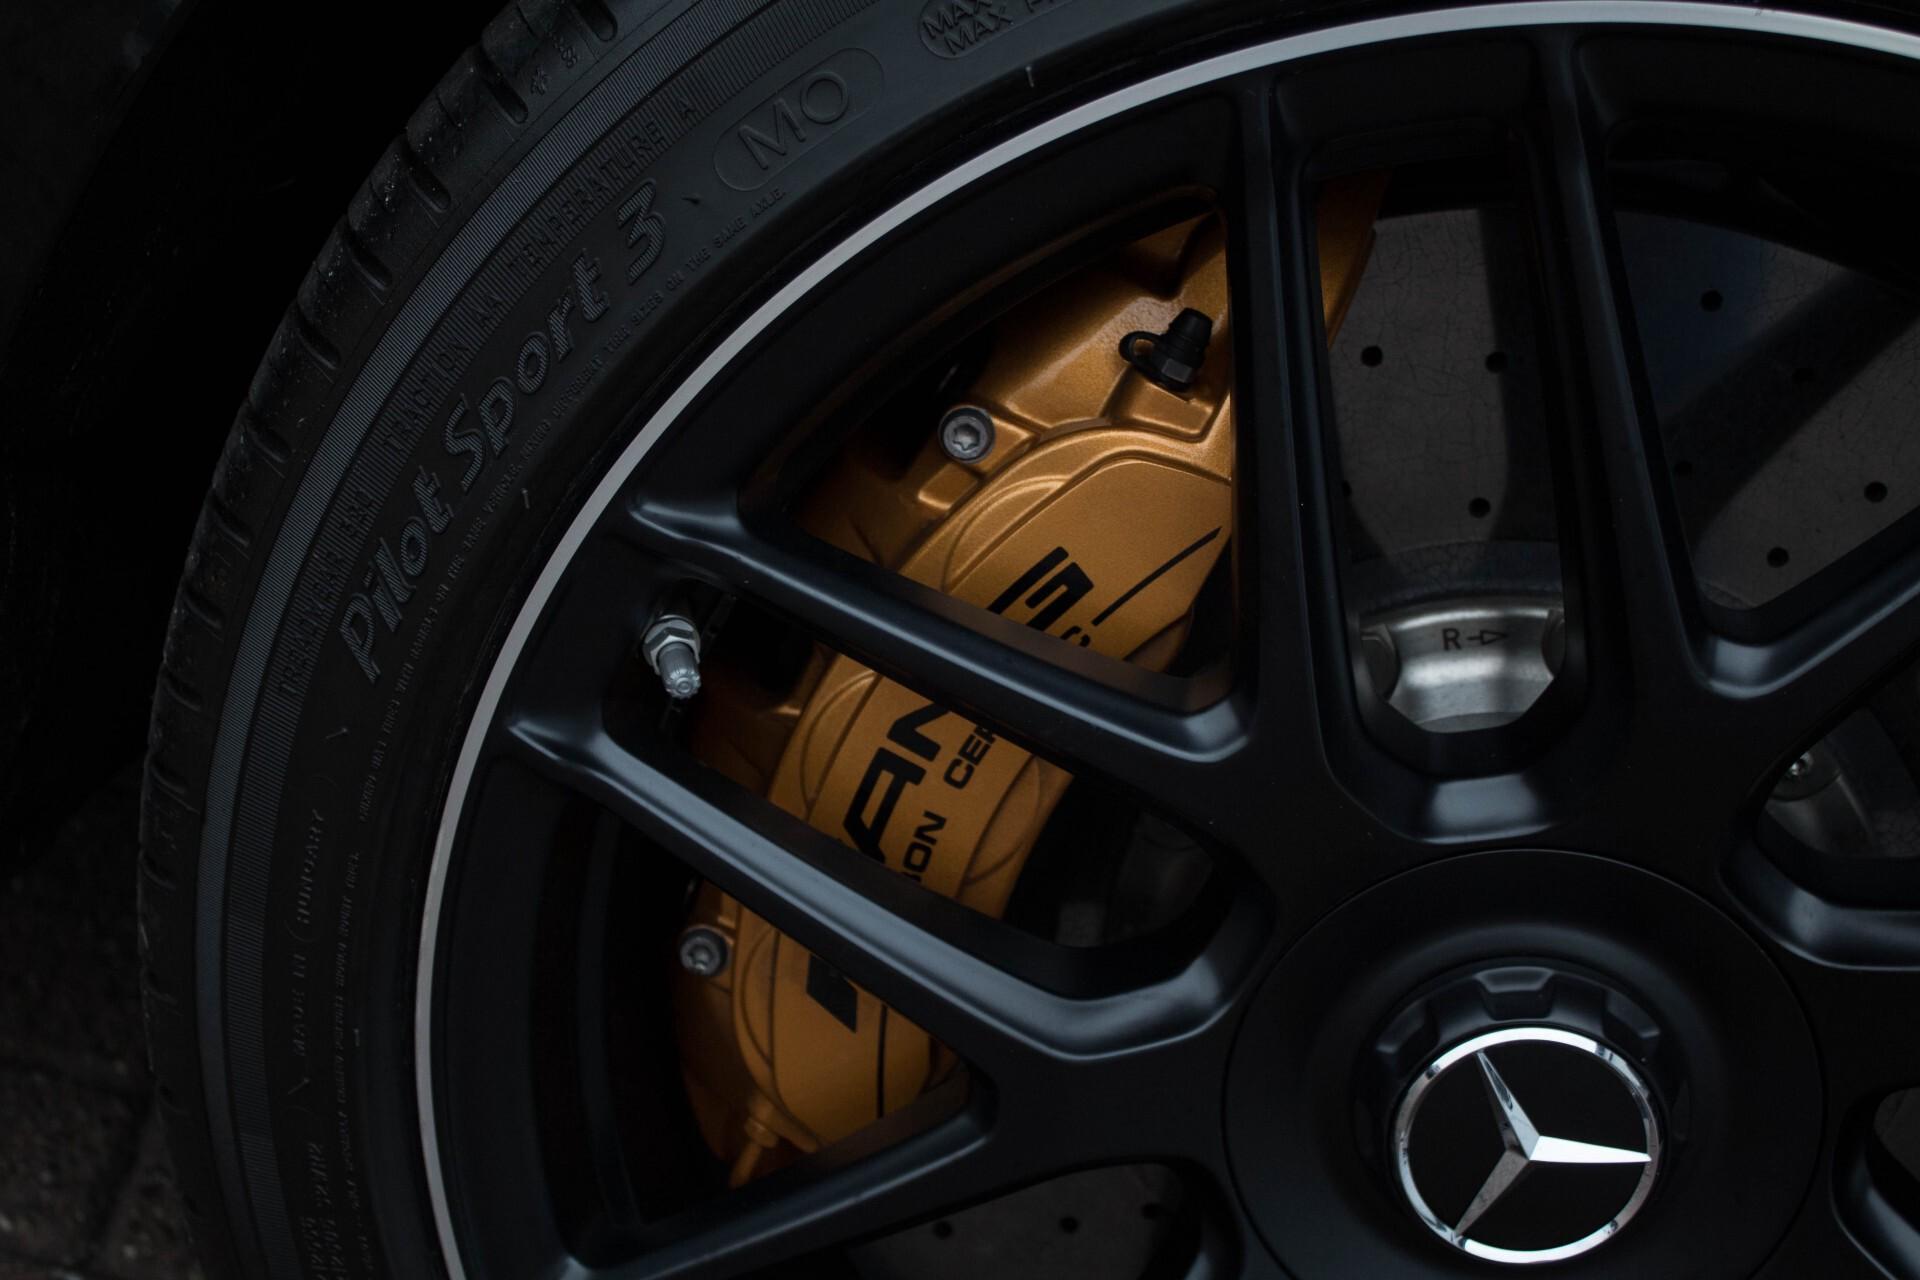 Mercedes-Benz S-Klasse Cabrio 63 AMG 4-M Ceramic/Designo/Carbon/Burmester High End Aut Foto 63